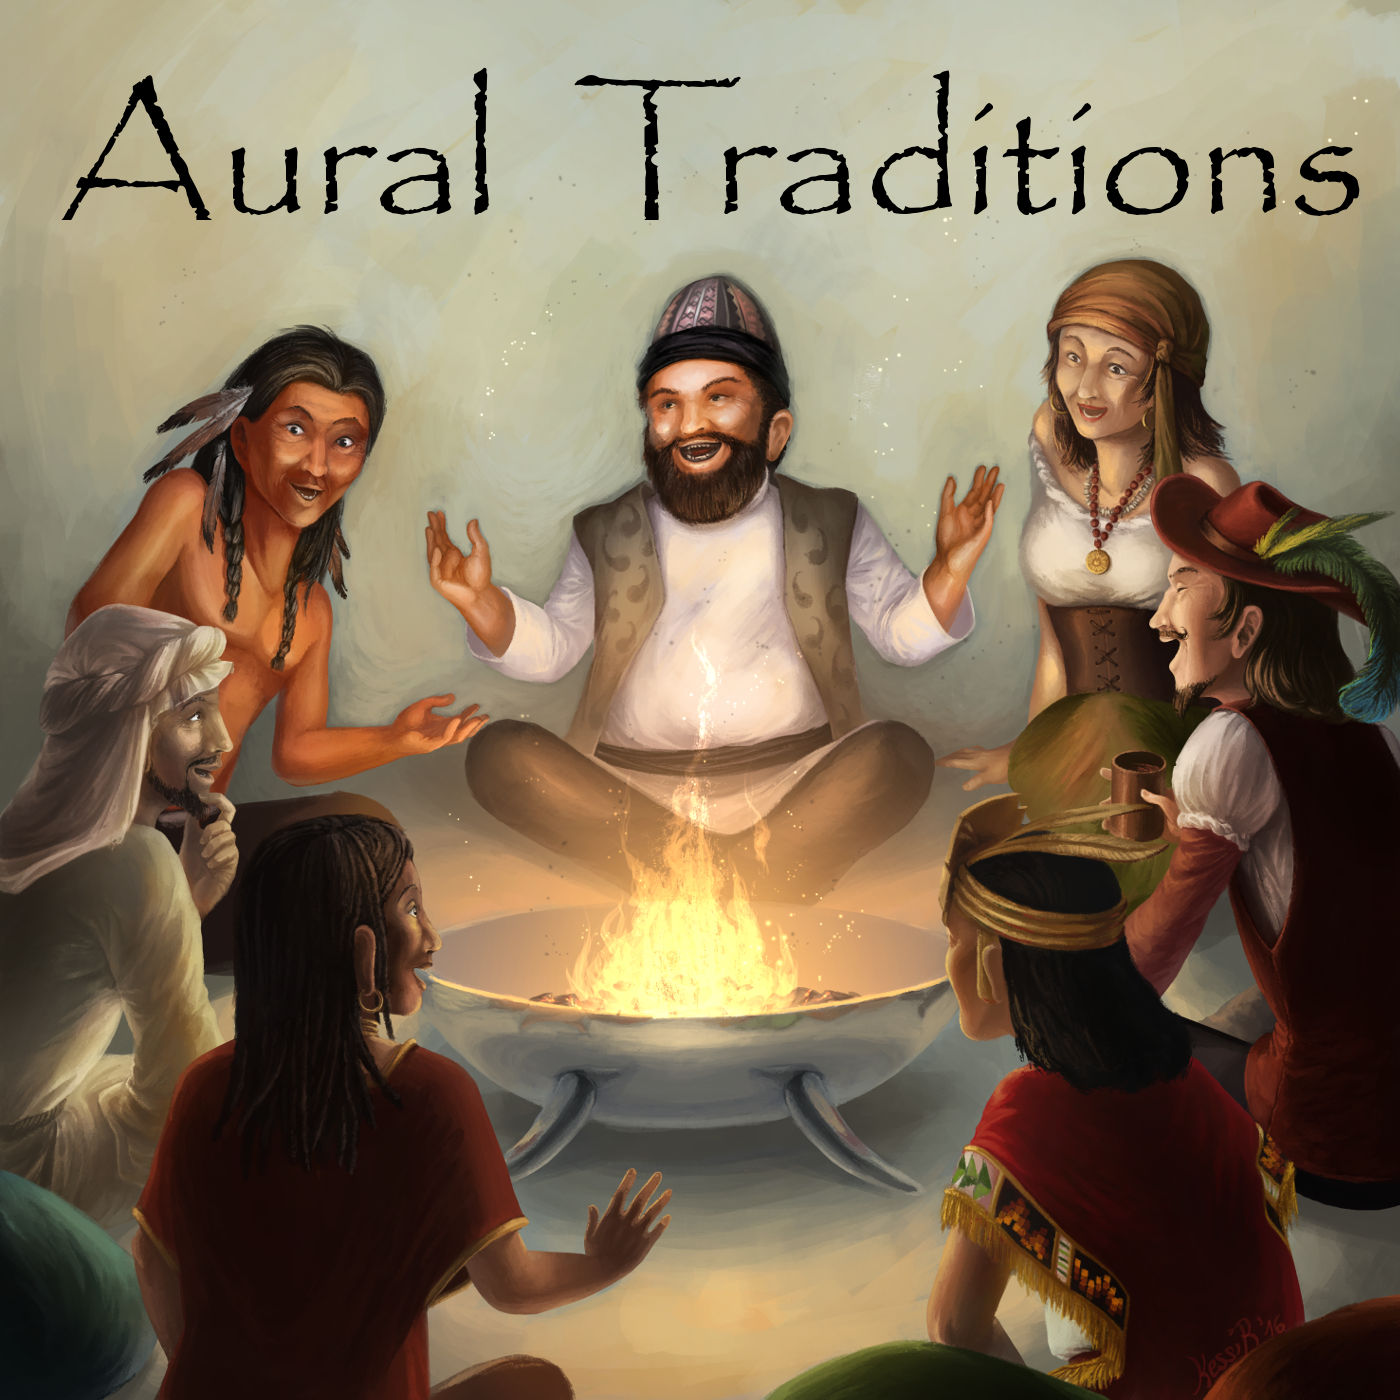 AuralTraditions-CoverArt-1400.jpg